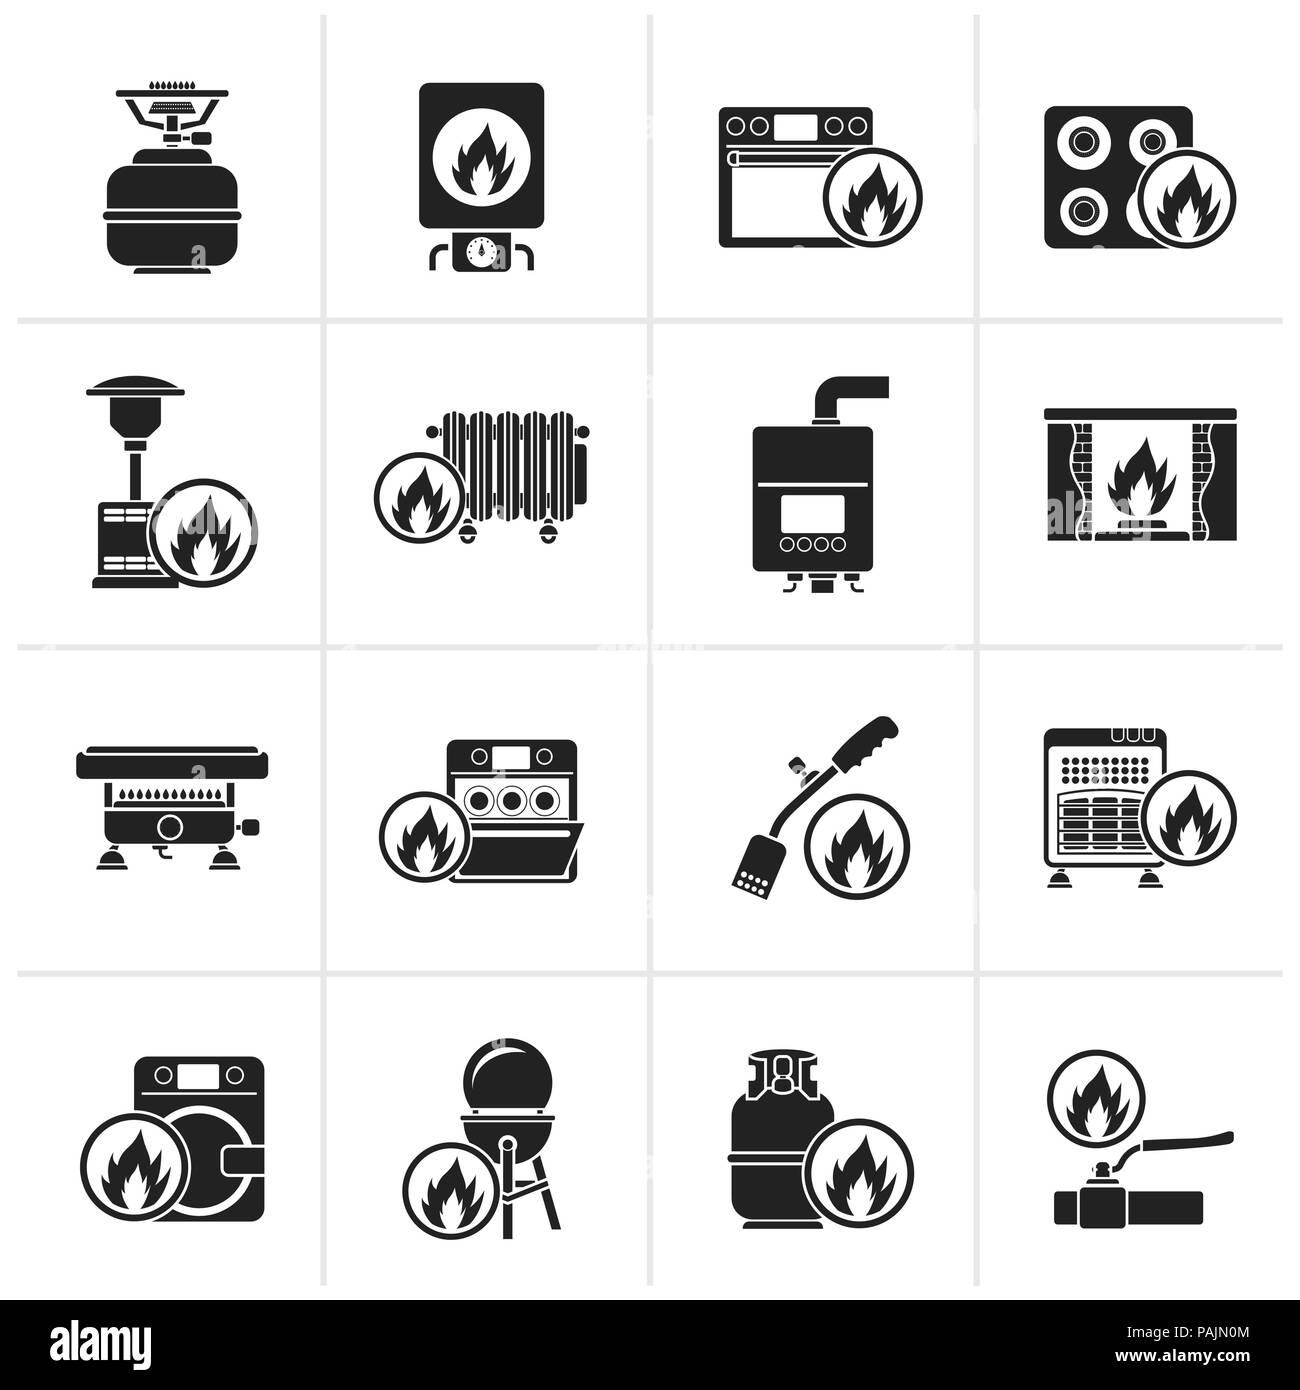 Black Household Gas Appliances icons - vector icon set - Stock Image